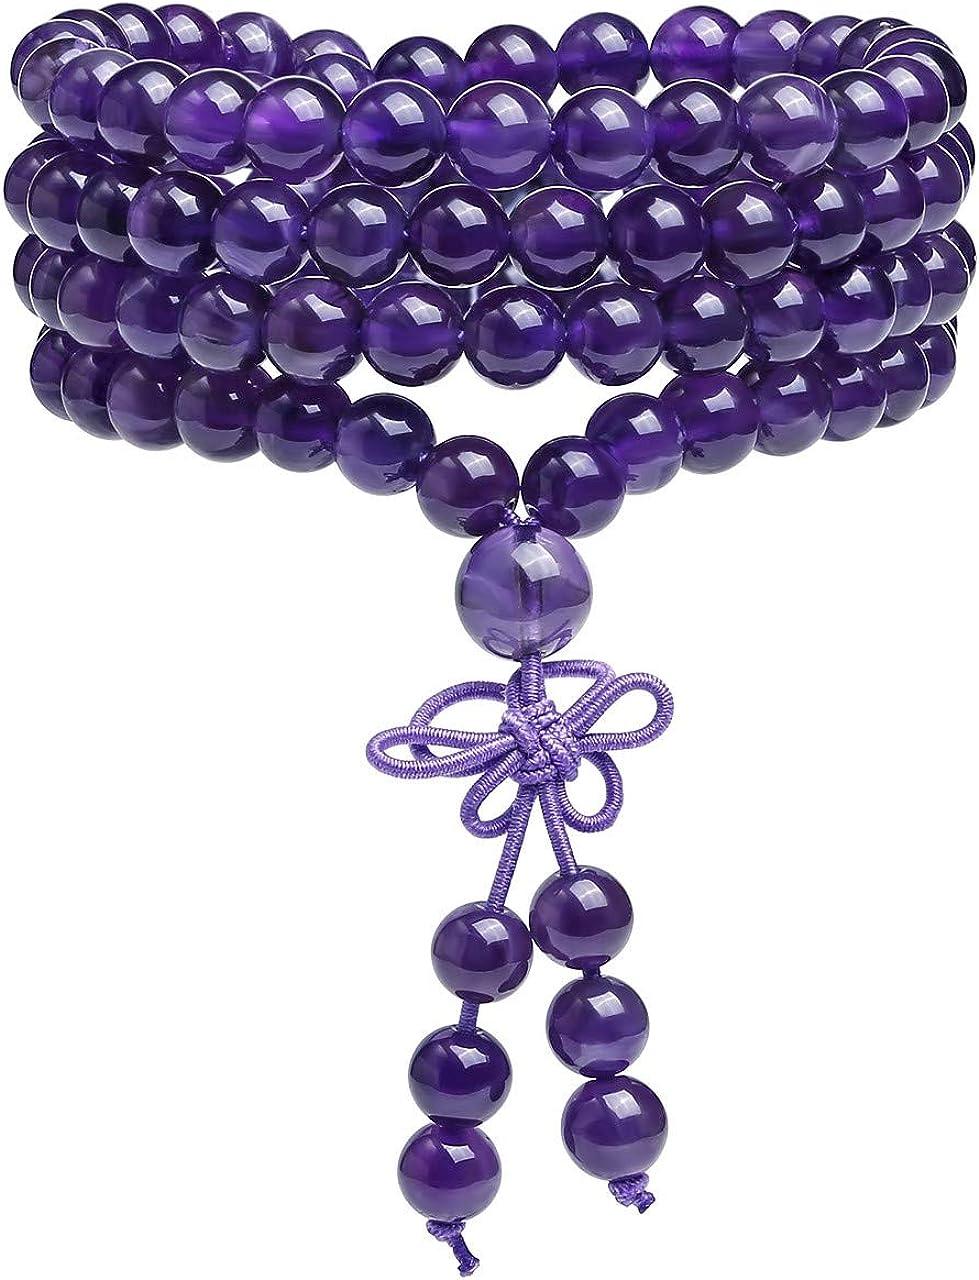 6 mm Azurite 108 Perles Mala bouddhiste Bracelet Collier Bracelet Chic spiritualité